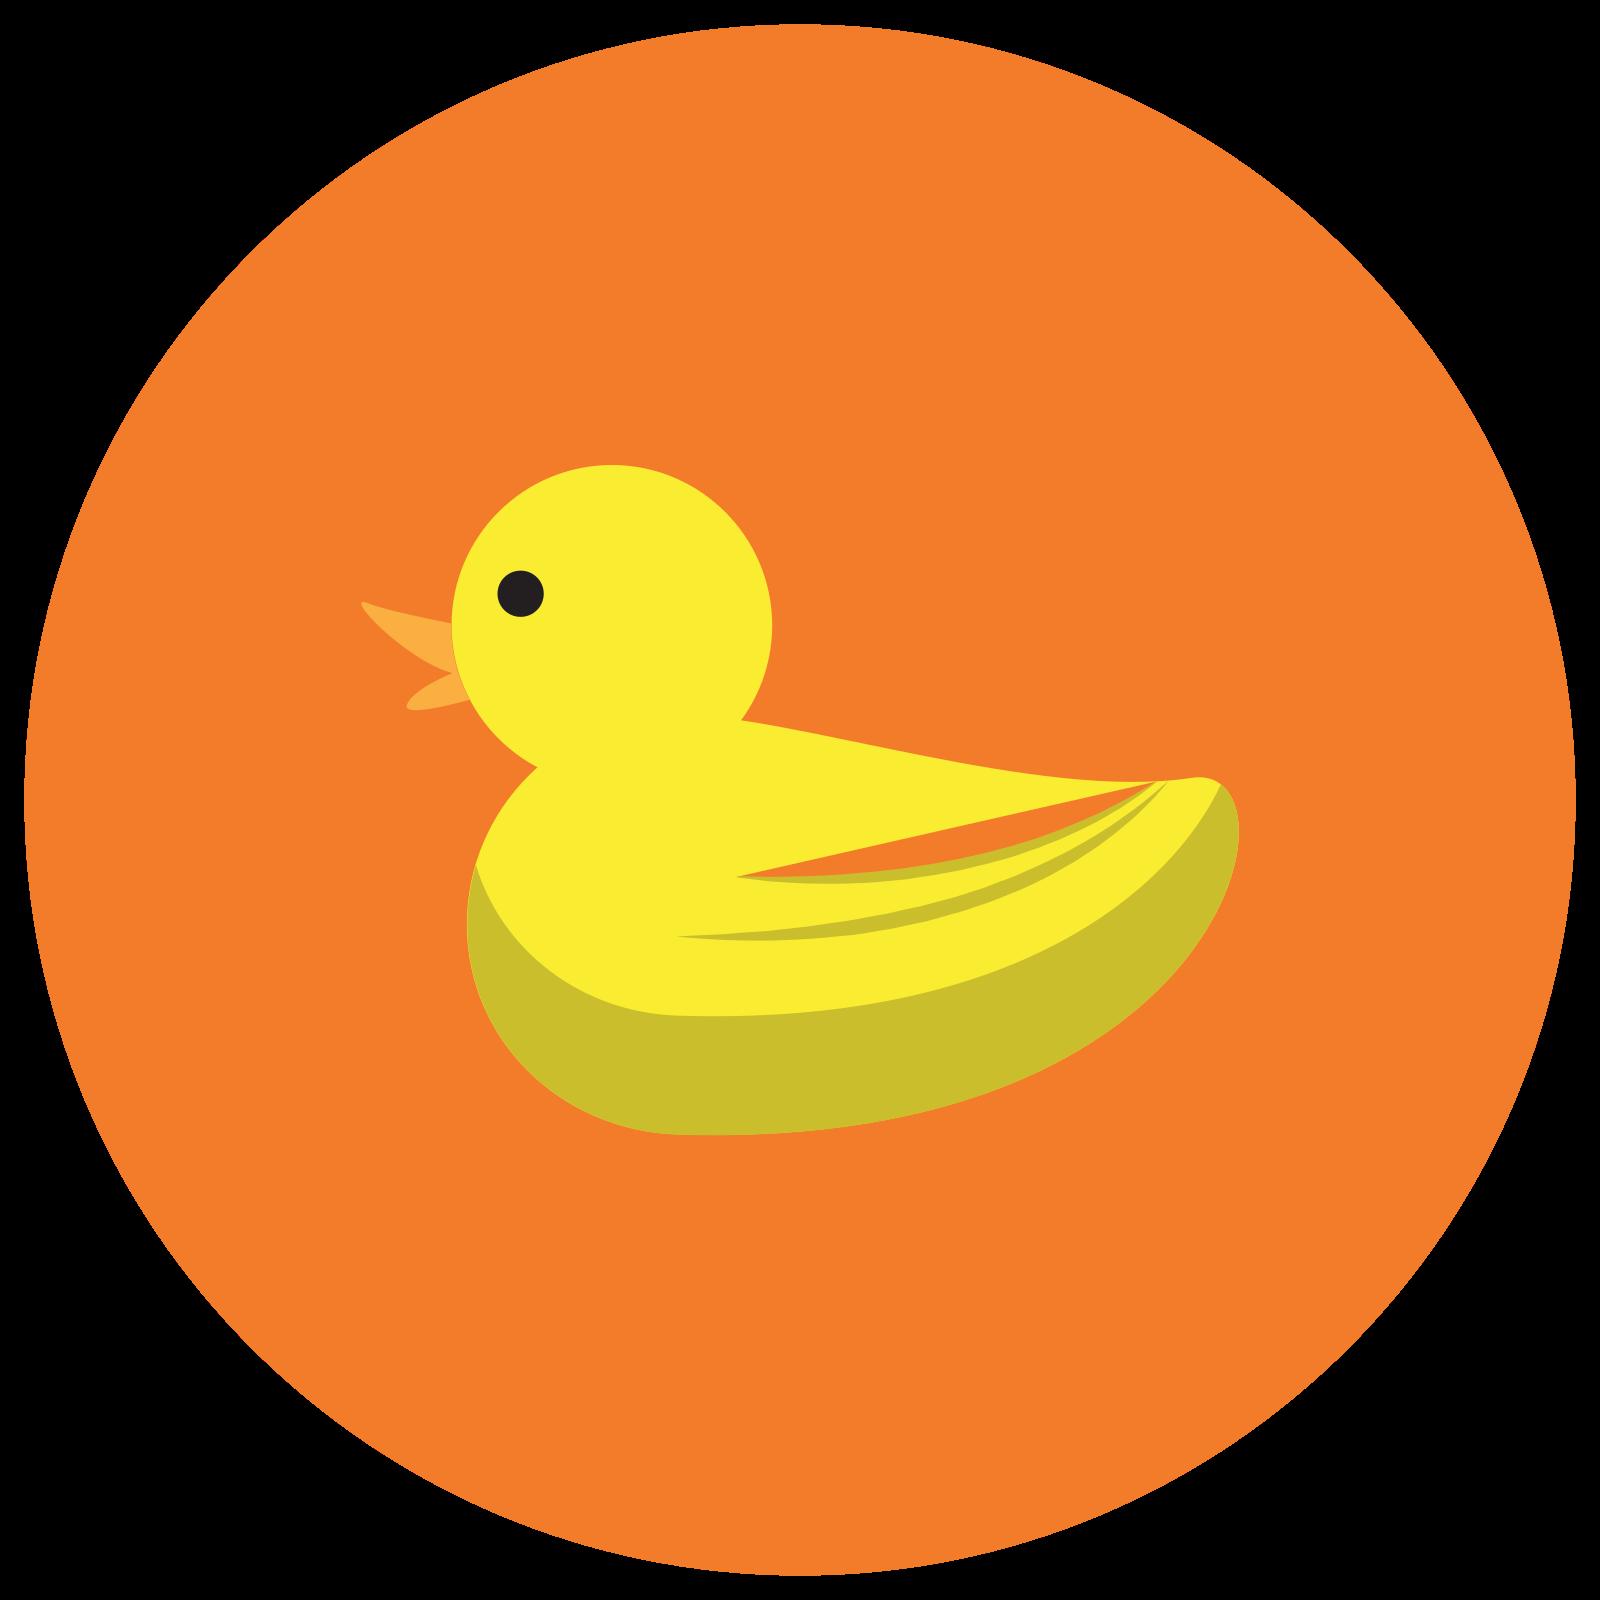 Rubber Ducky icon